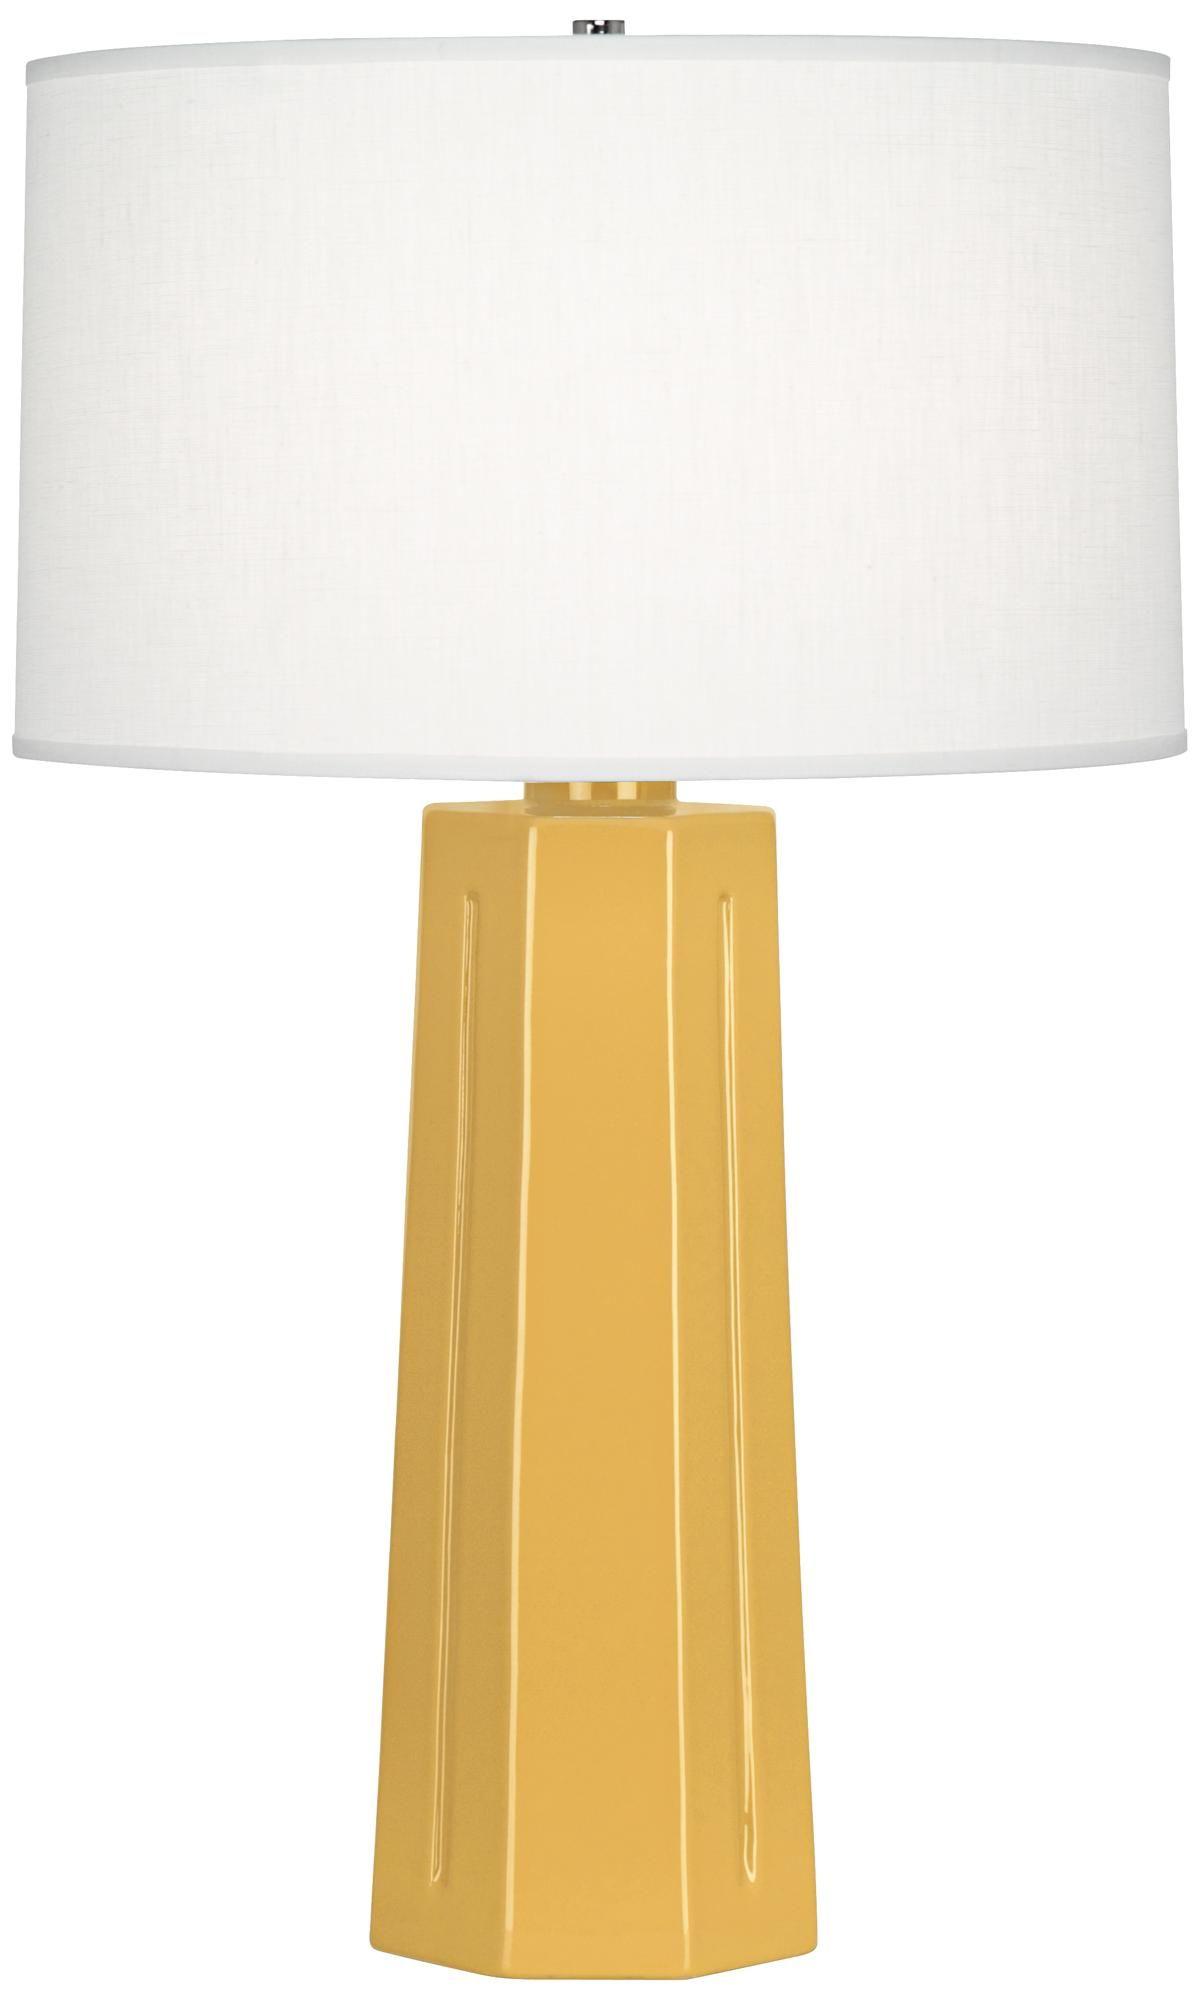 Robert Abbey Mason Sunset Yellow Ceramic Table Lamp 5t494 Lamps Plus Ceramic Table Ceramic Table Lamps Table Lamp